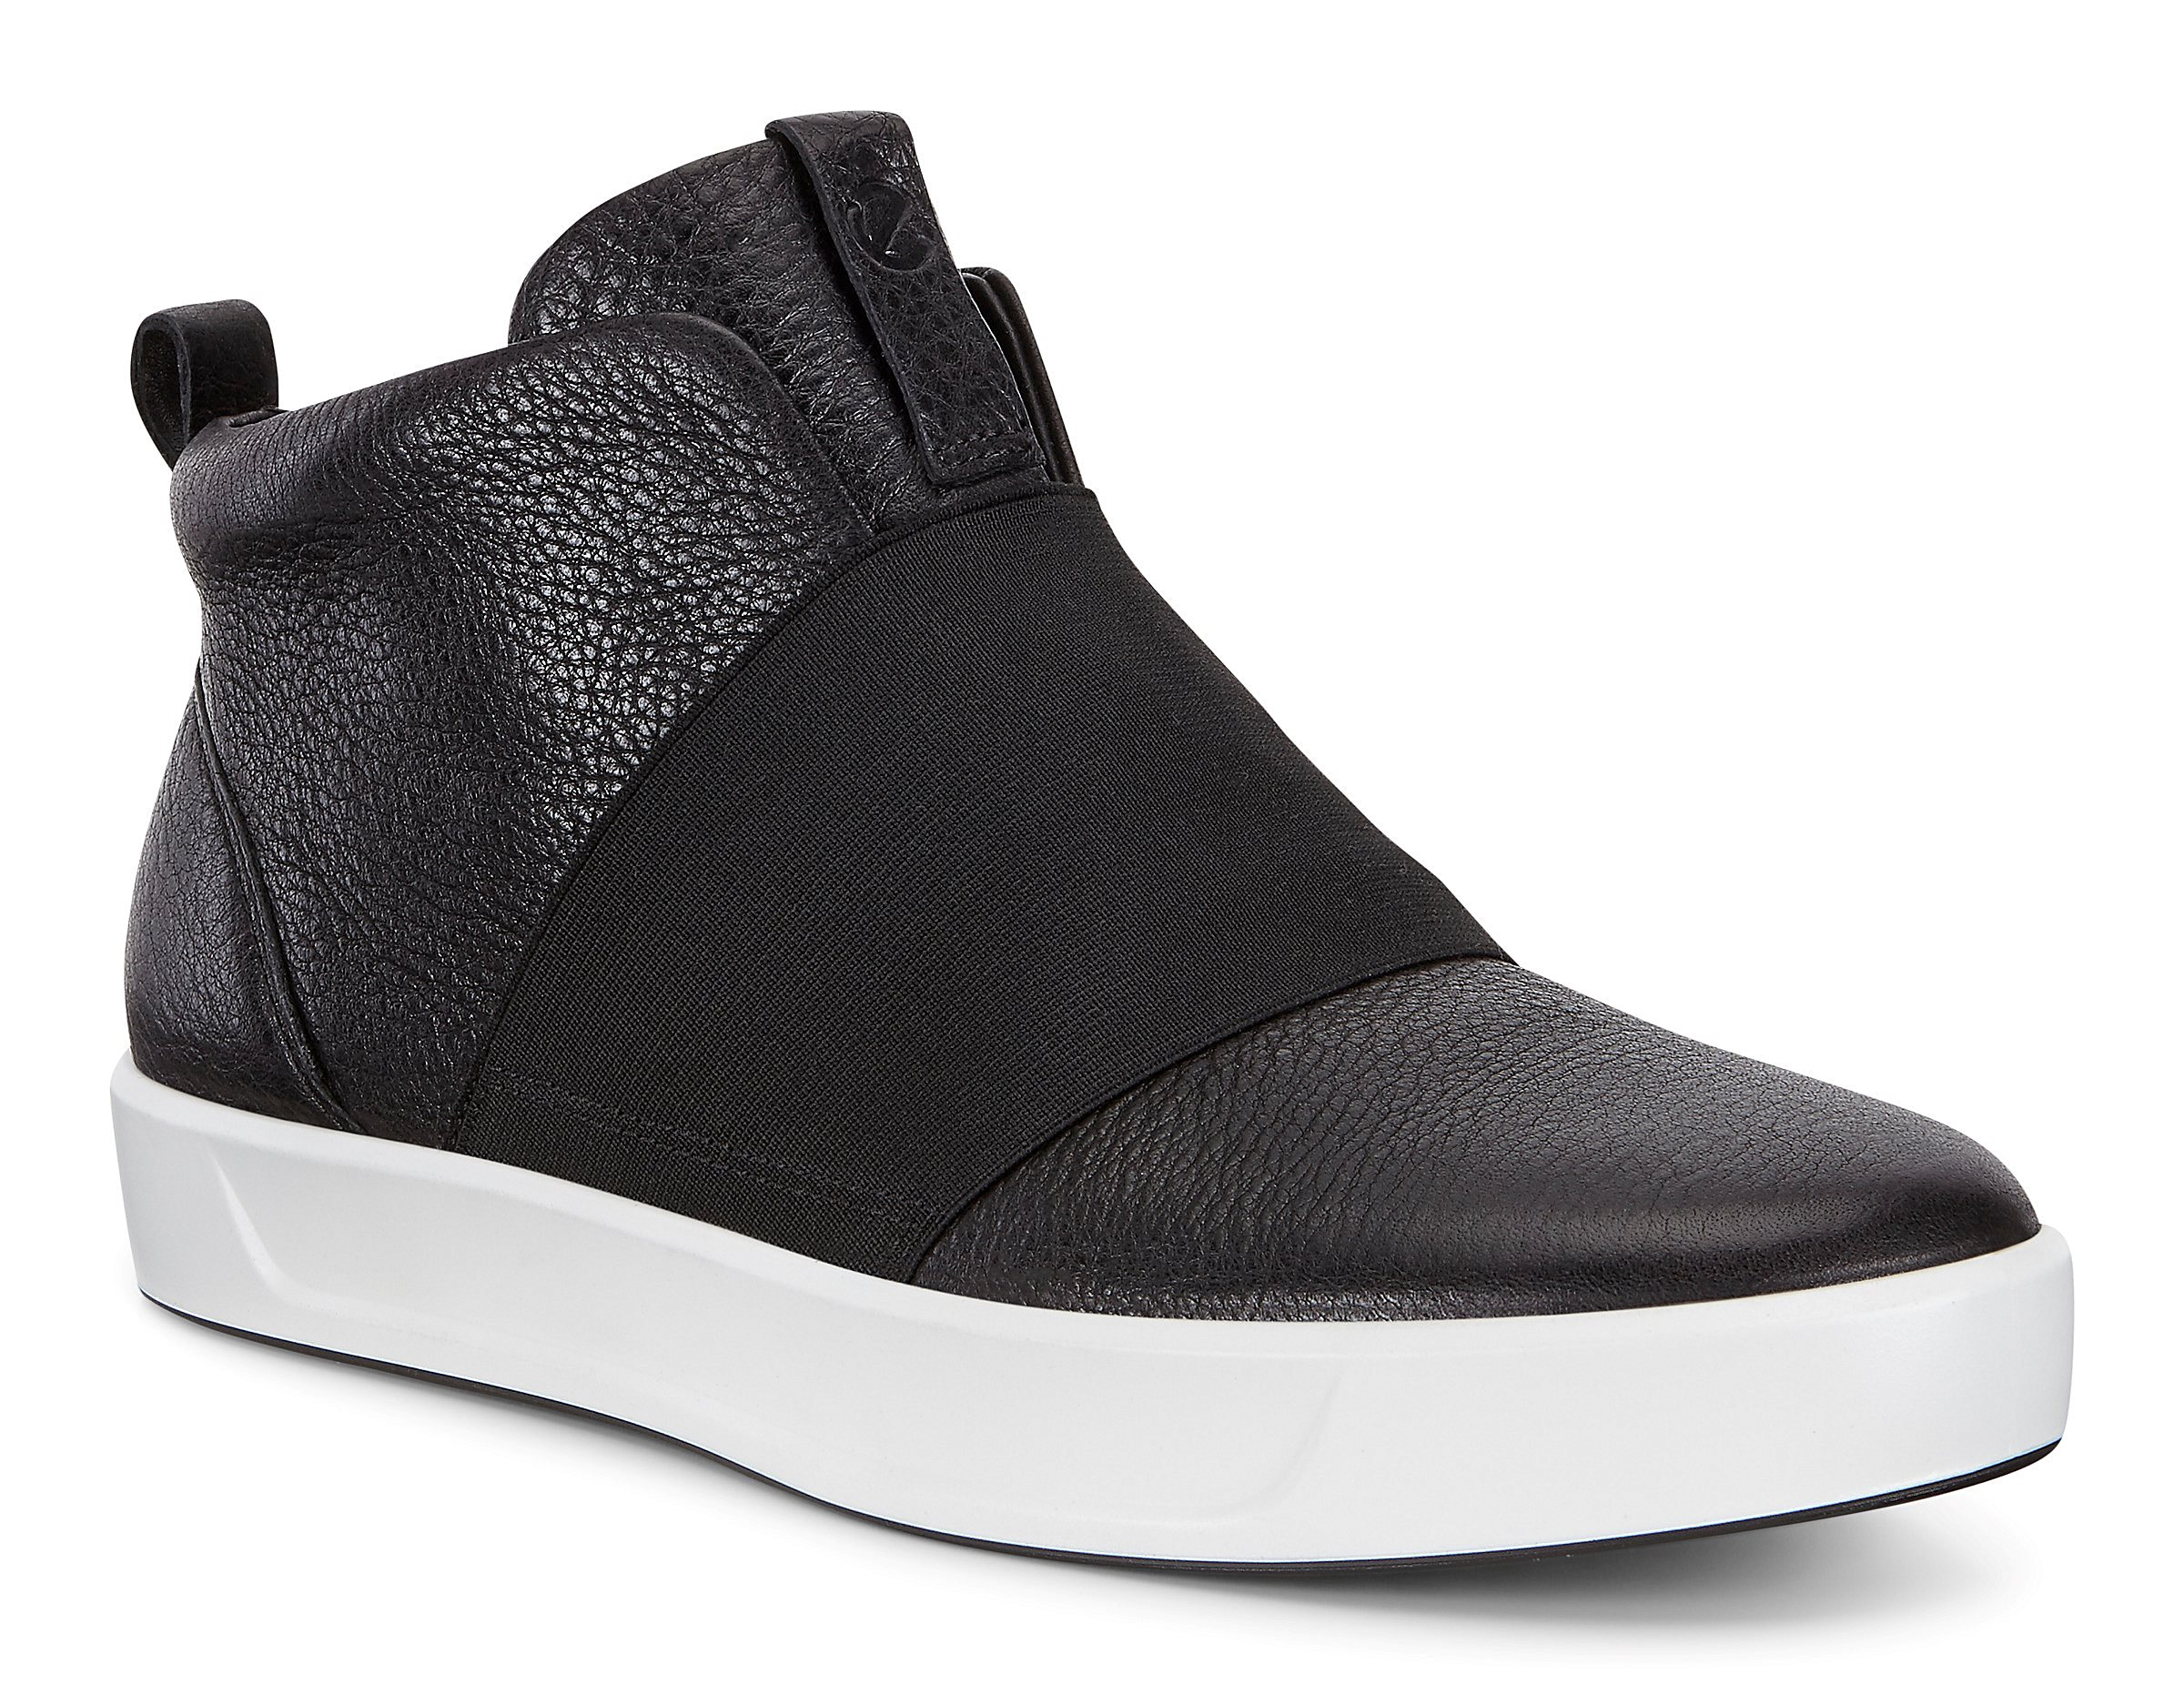 14fb8b131f6ffc ECCO SOFT 8 LADIES DAMEN Schuhe Stiefel